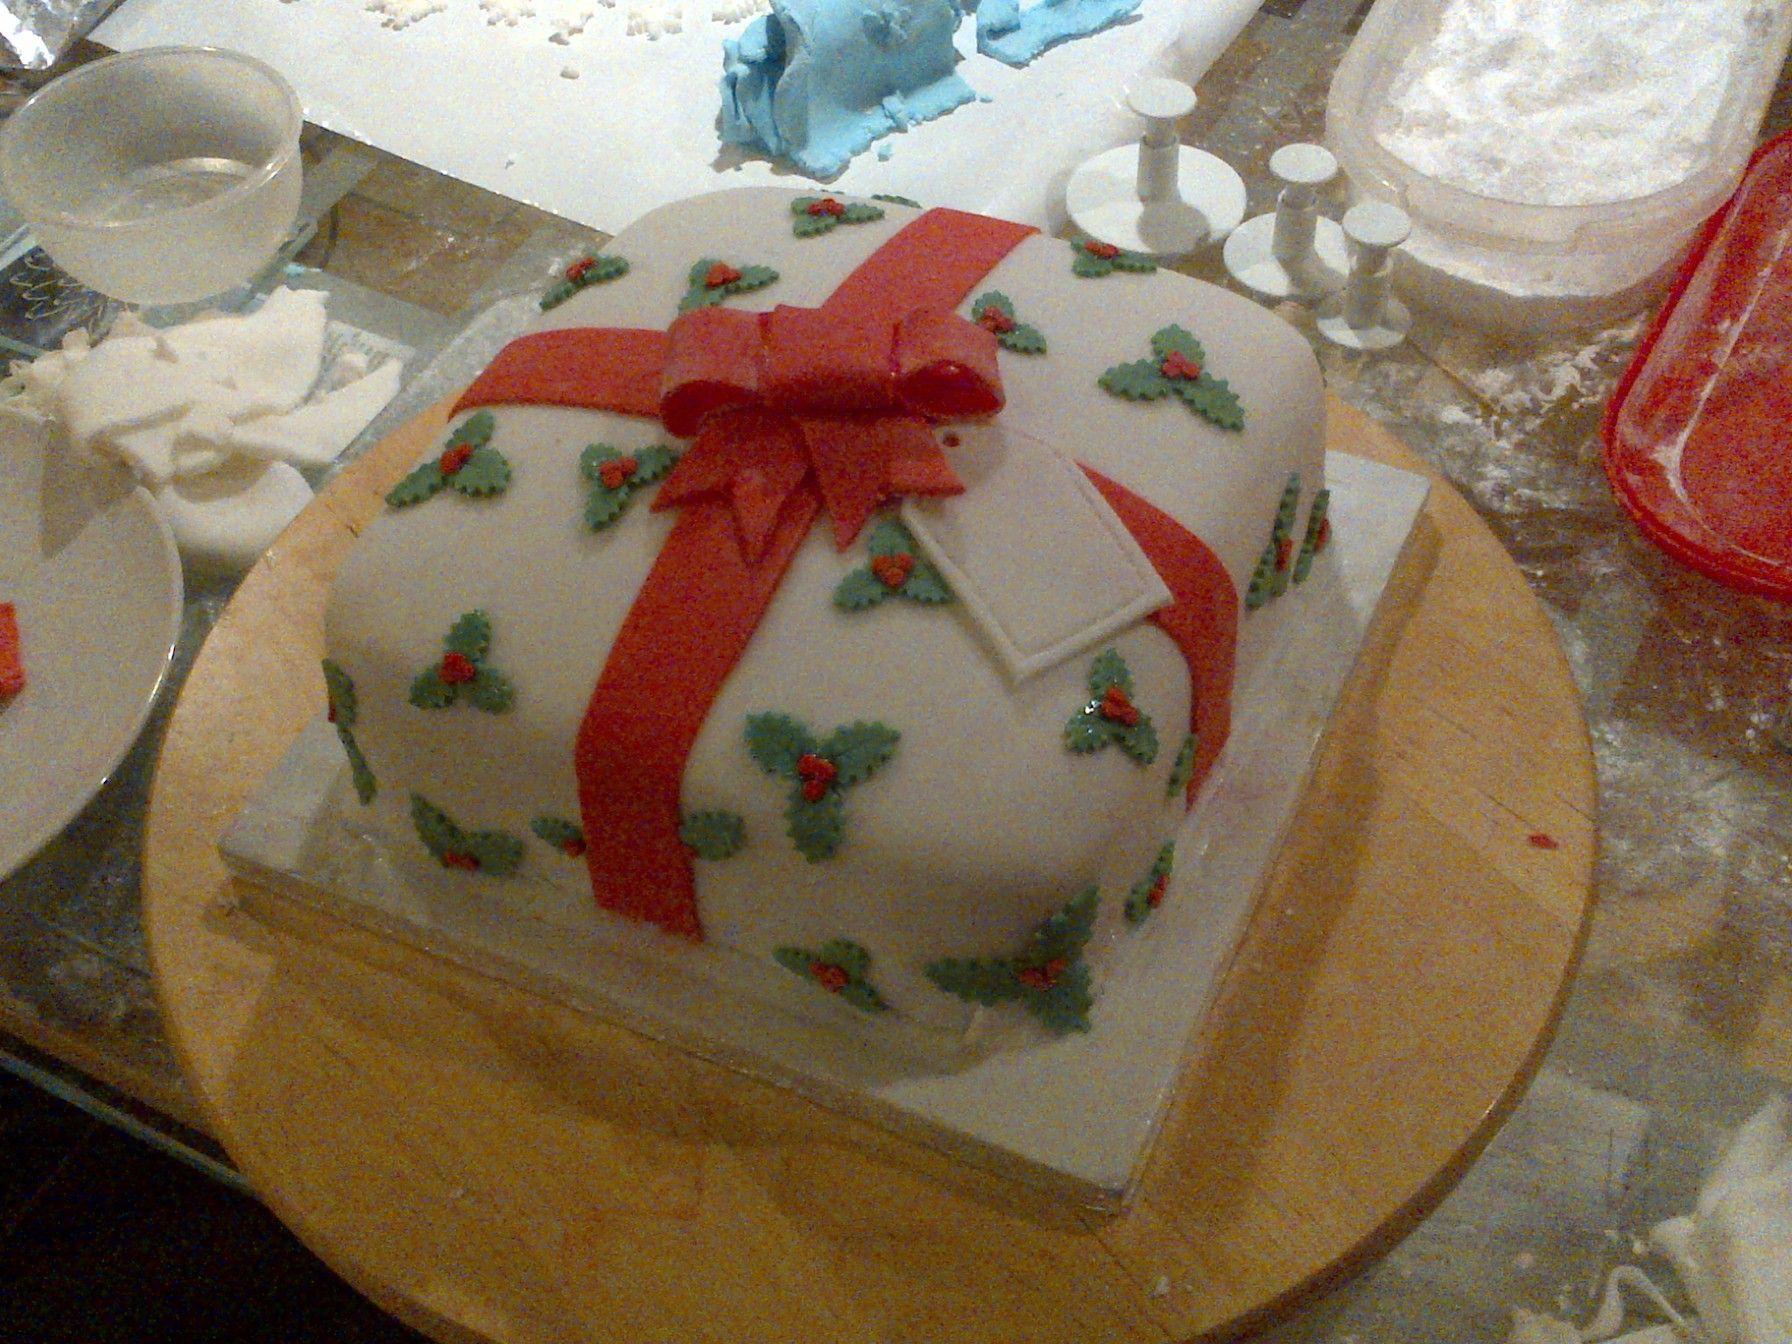 Beautiful Christmas Present Cake 1792 x 1344 · 599 kB · jpeg